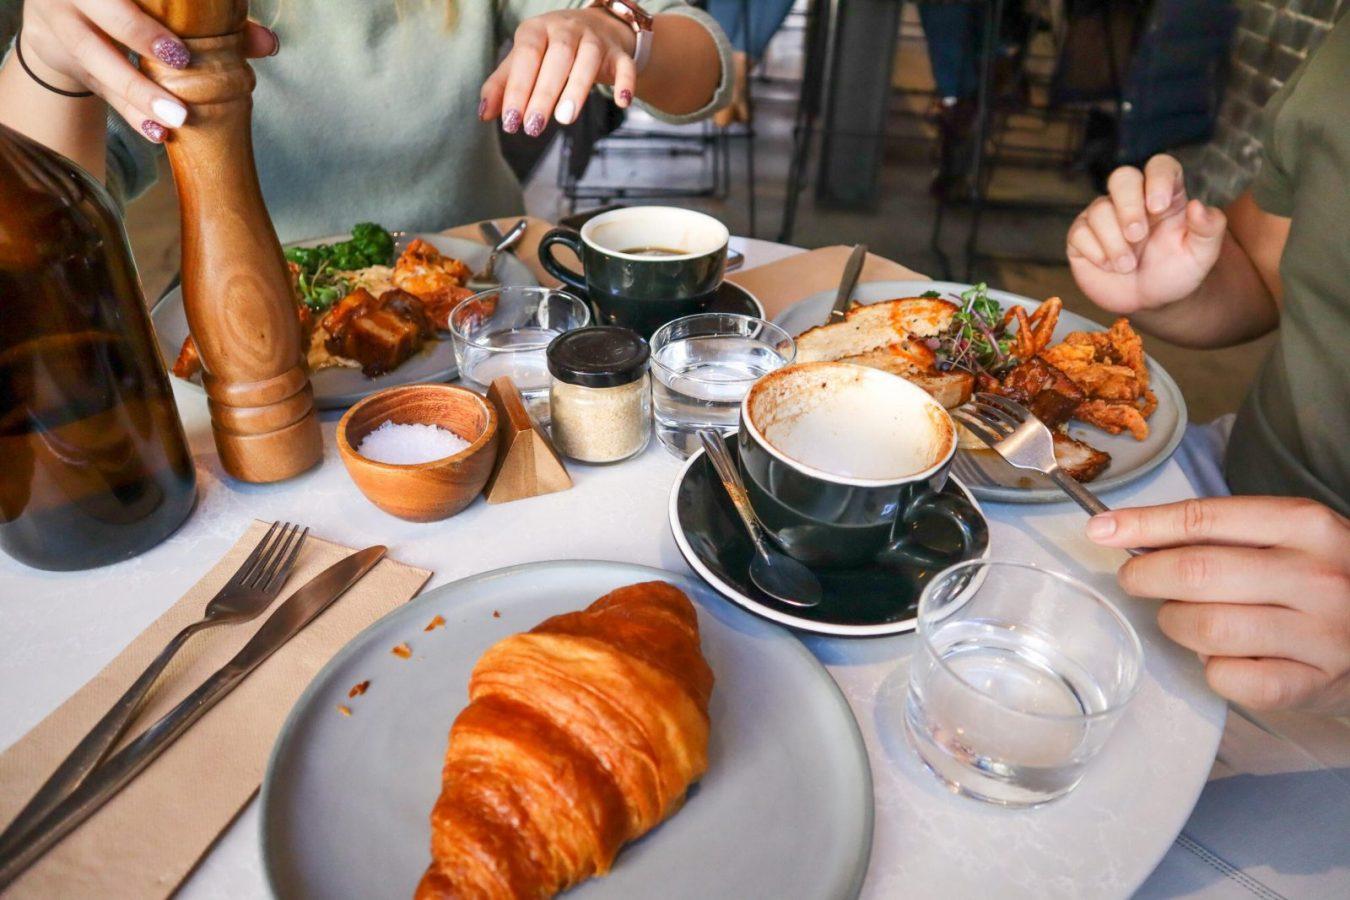 Француженки завтракают минимум полчаса